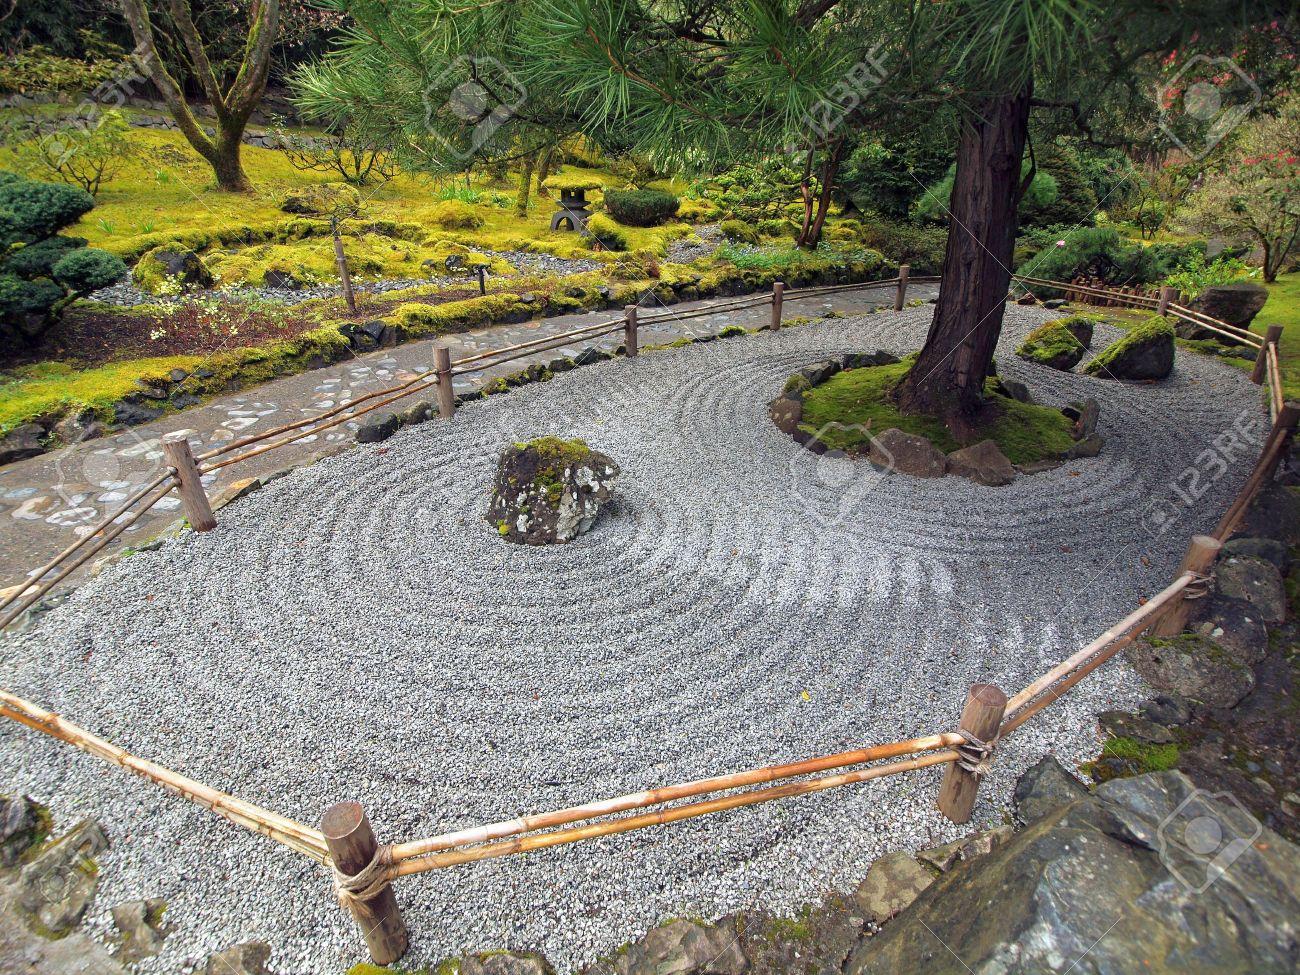 Ordinaire Arrangement Of Stones And Gravel Create Traditional Japanese Stone Garden  Stock Photo   6821183